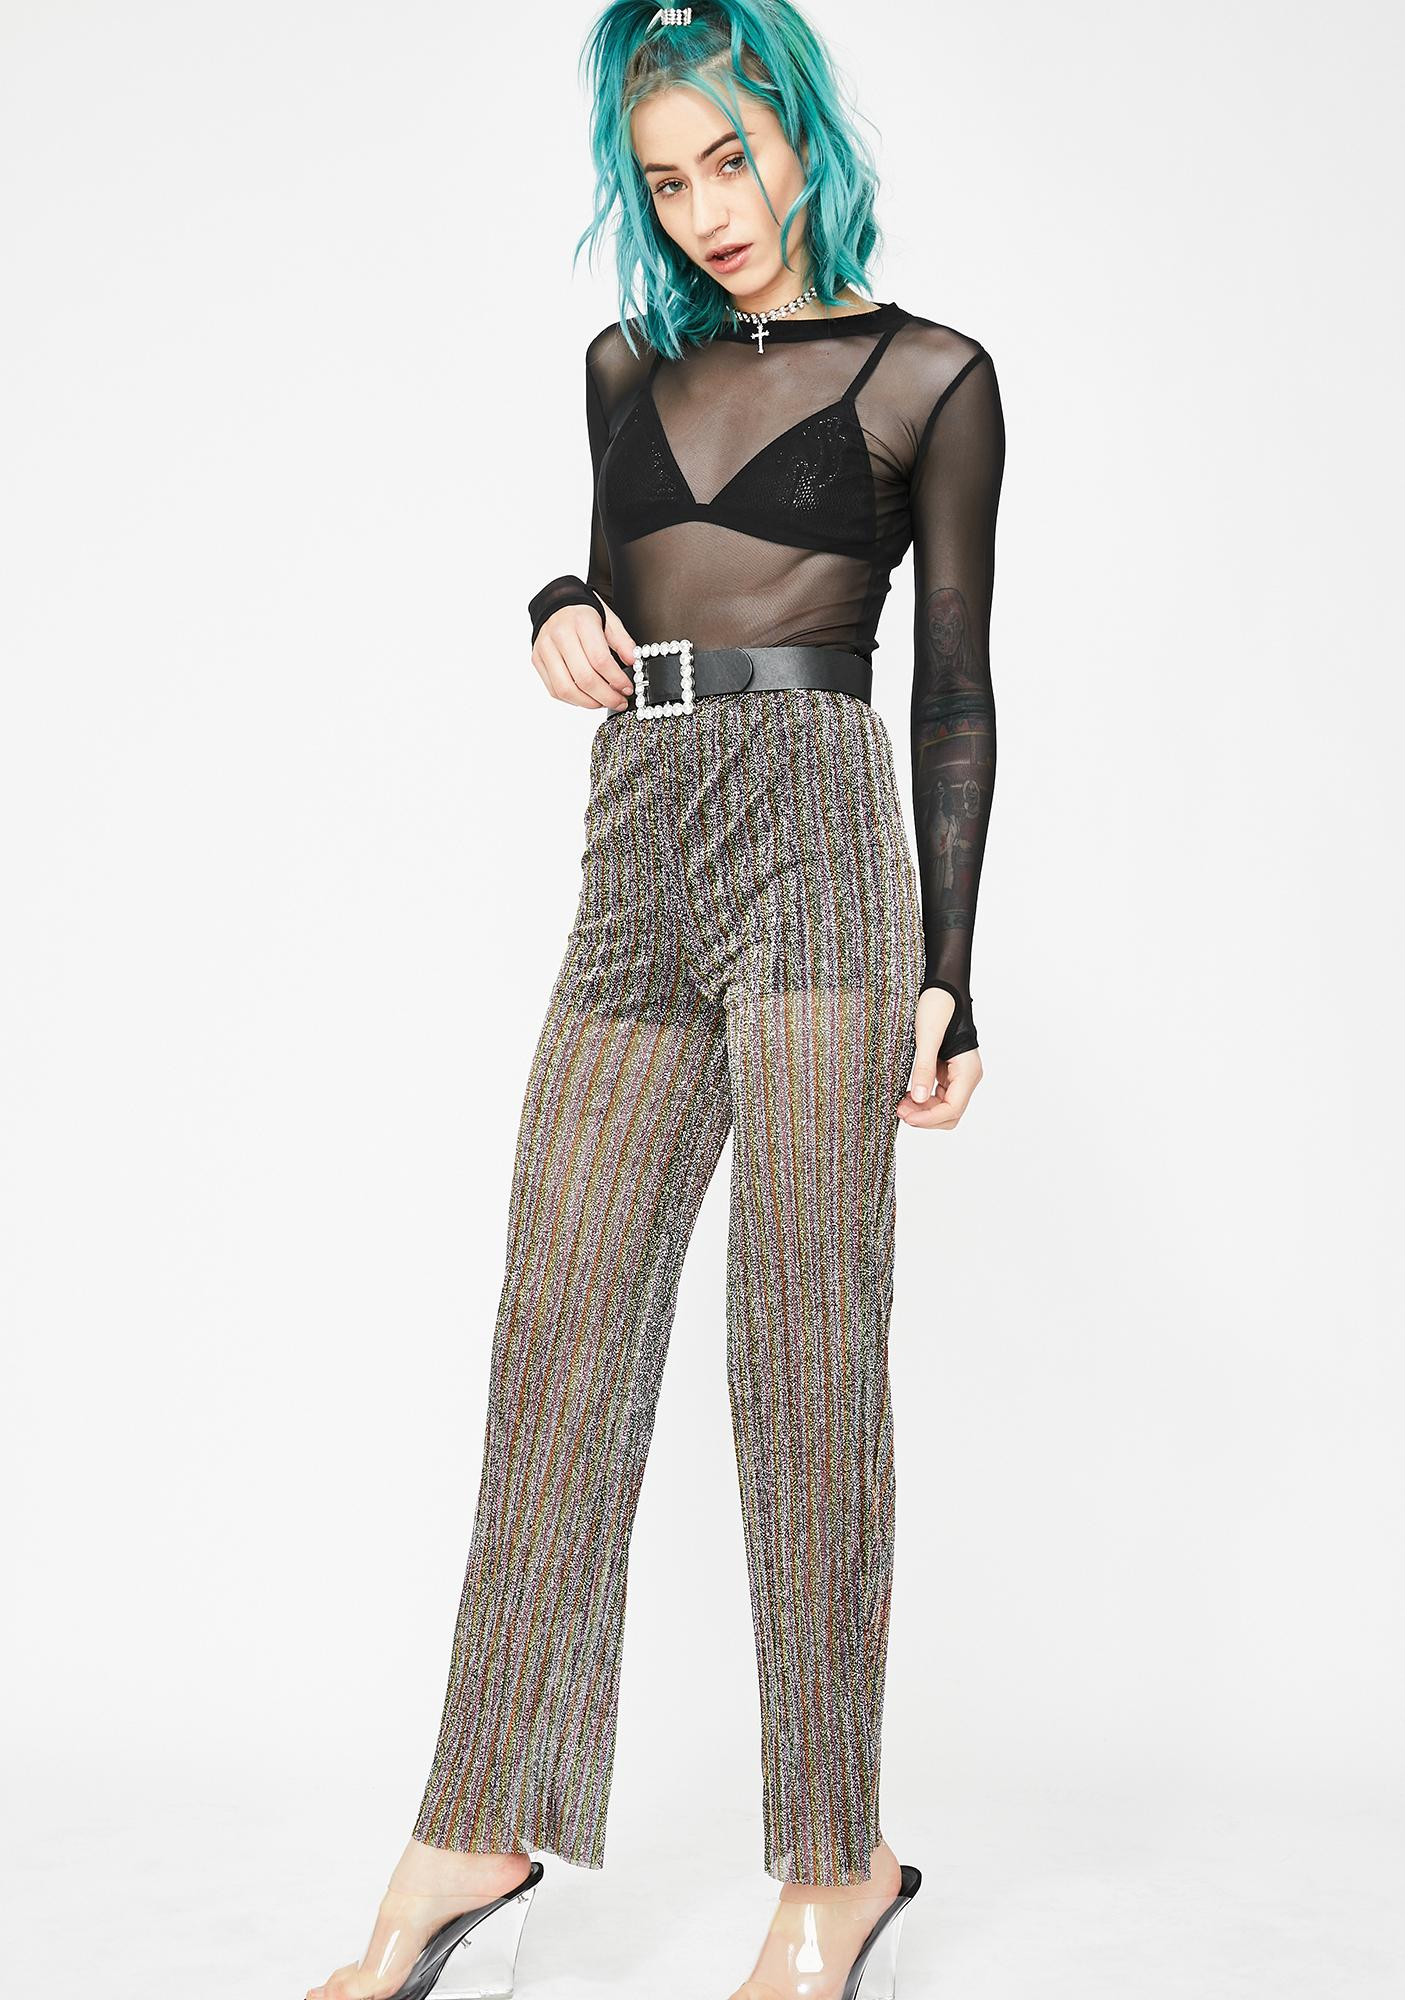 Reign Or Shine Sheer Pants